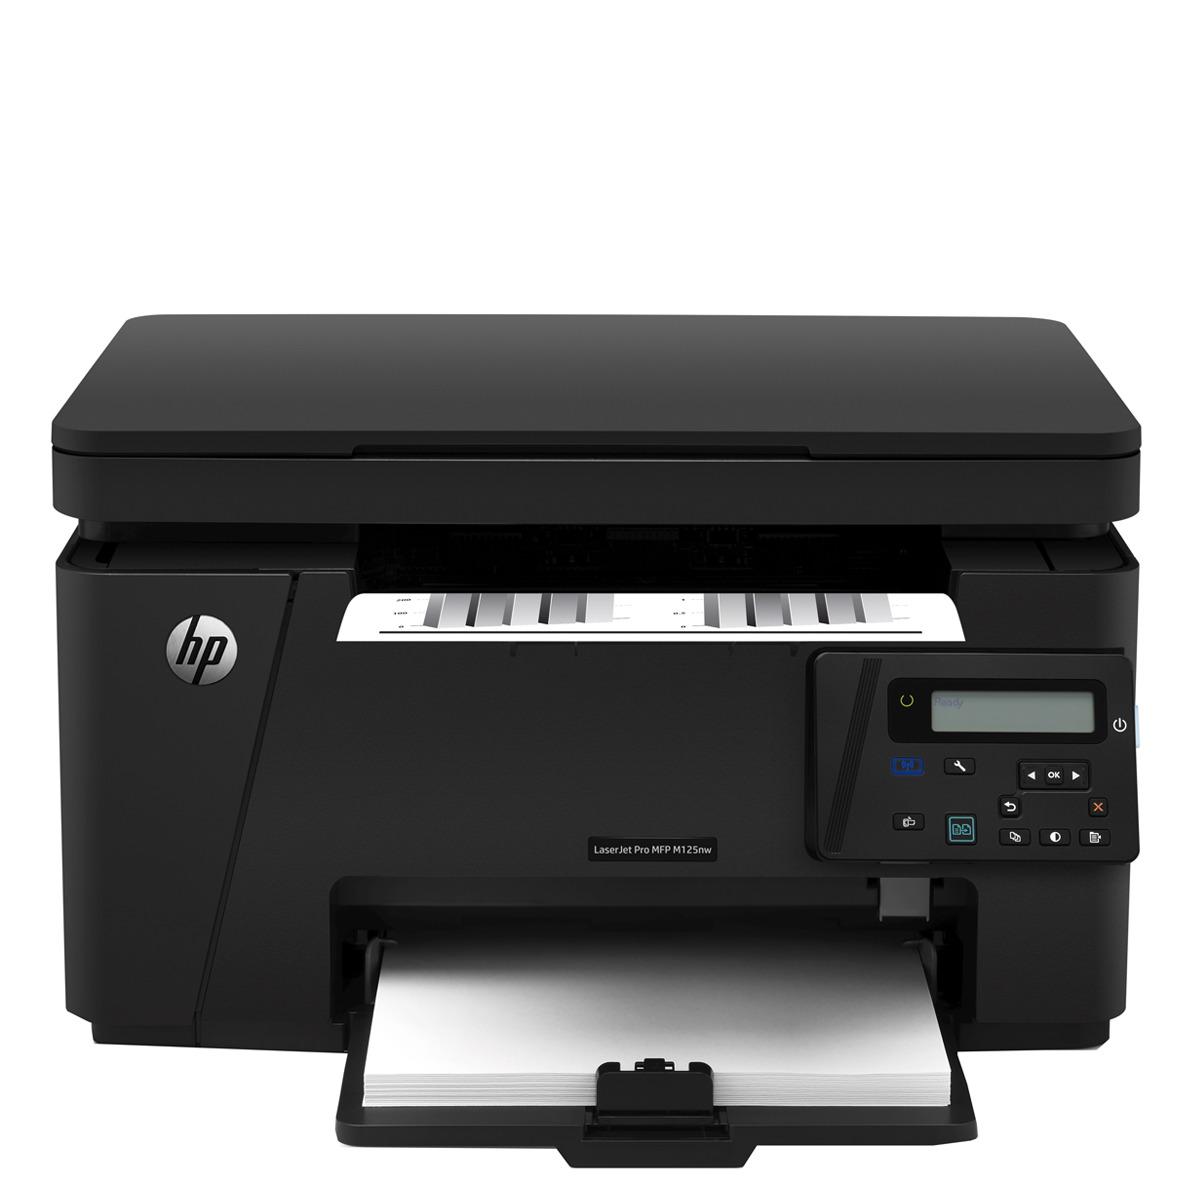 Impresora Multifunción Láser monocromo HP LaserJet Pro MFP M125nw Wi-Fi